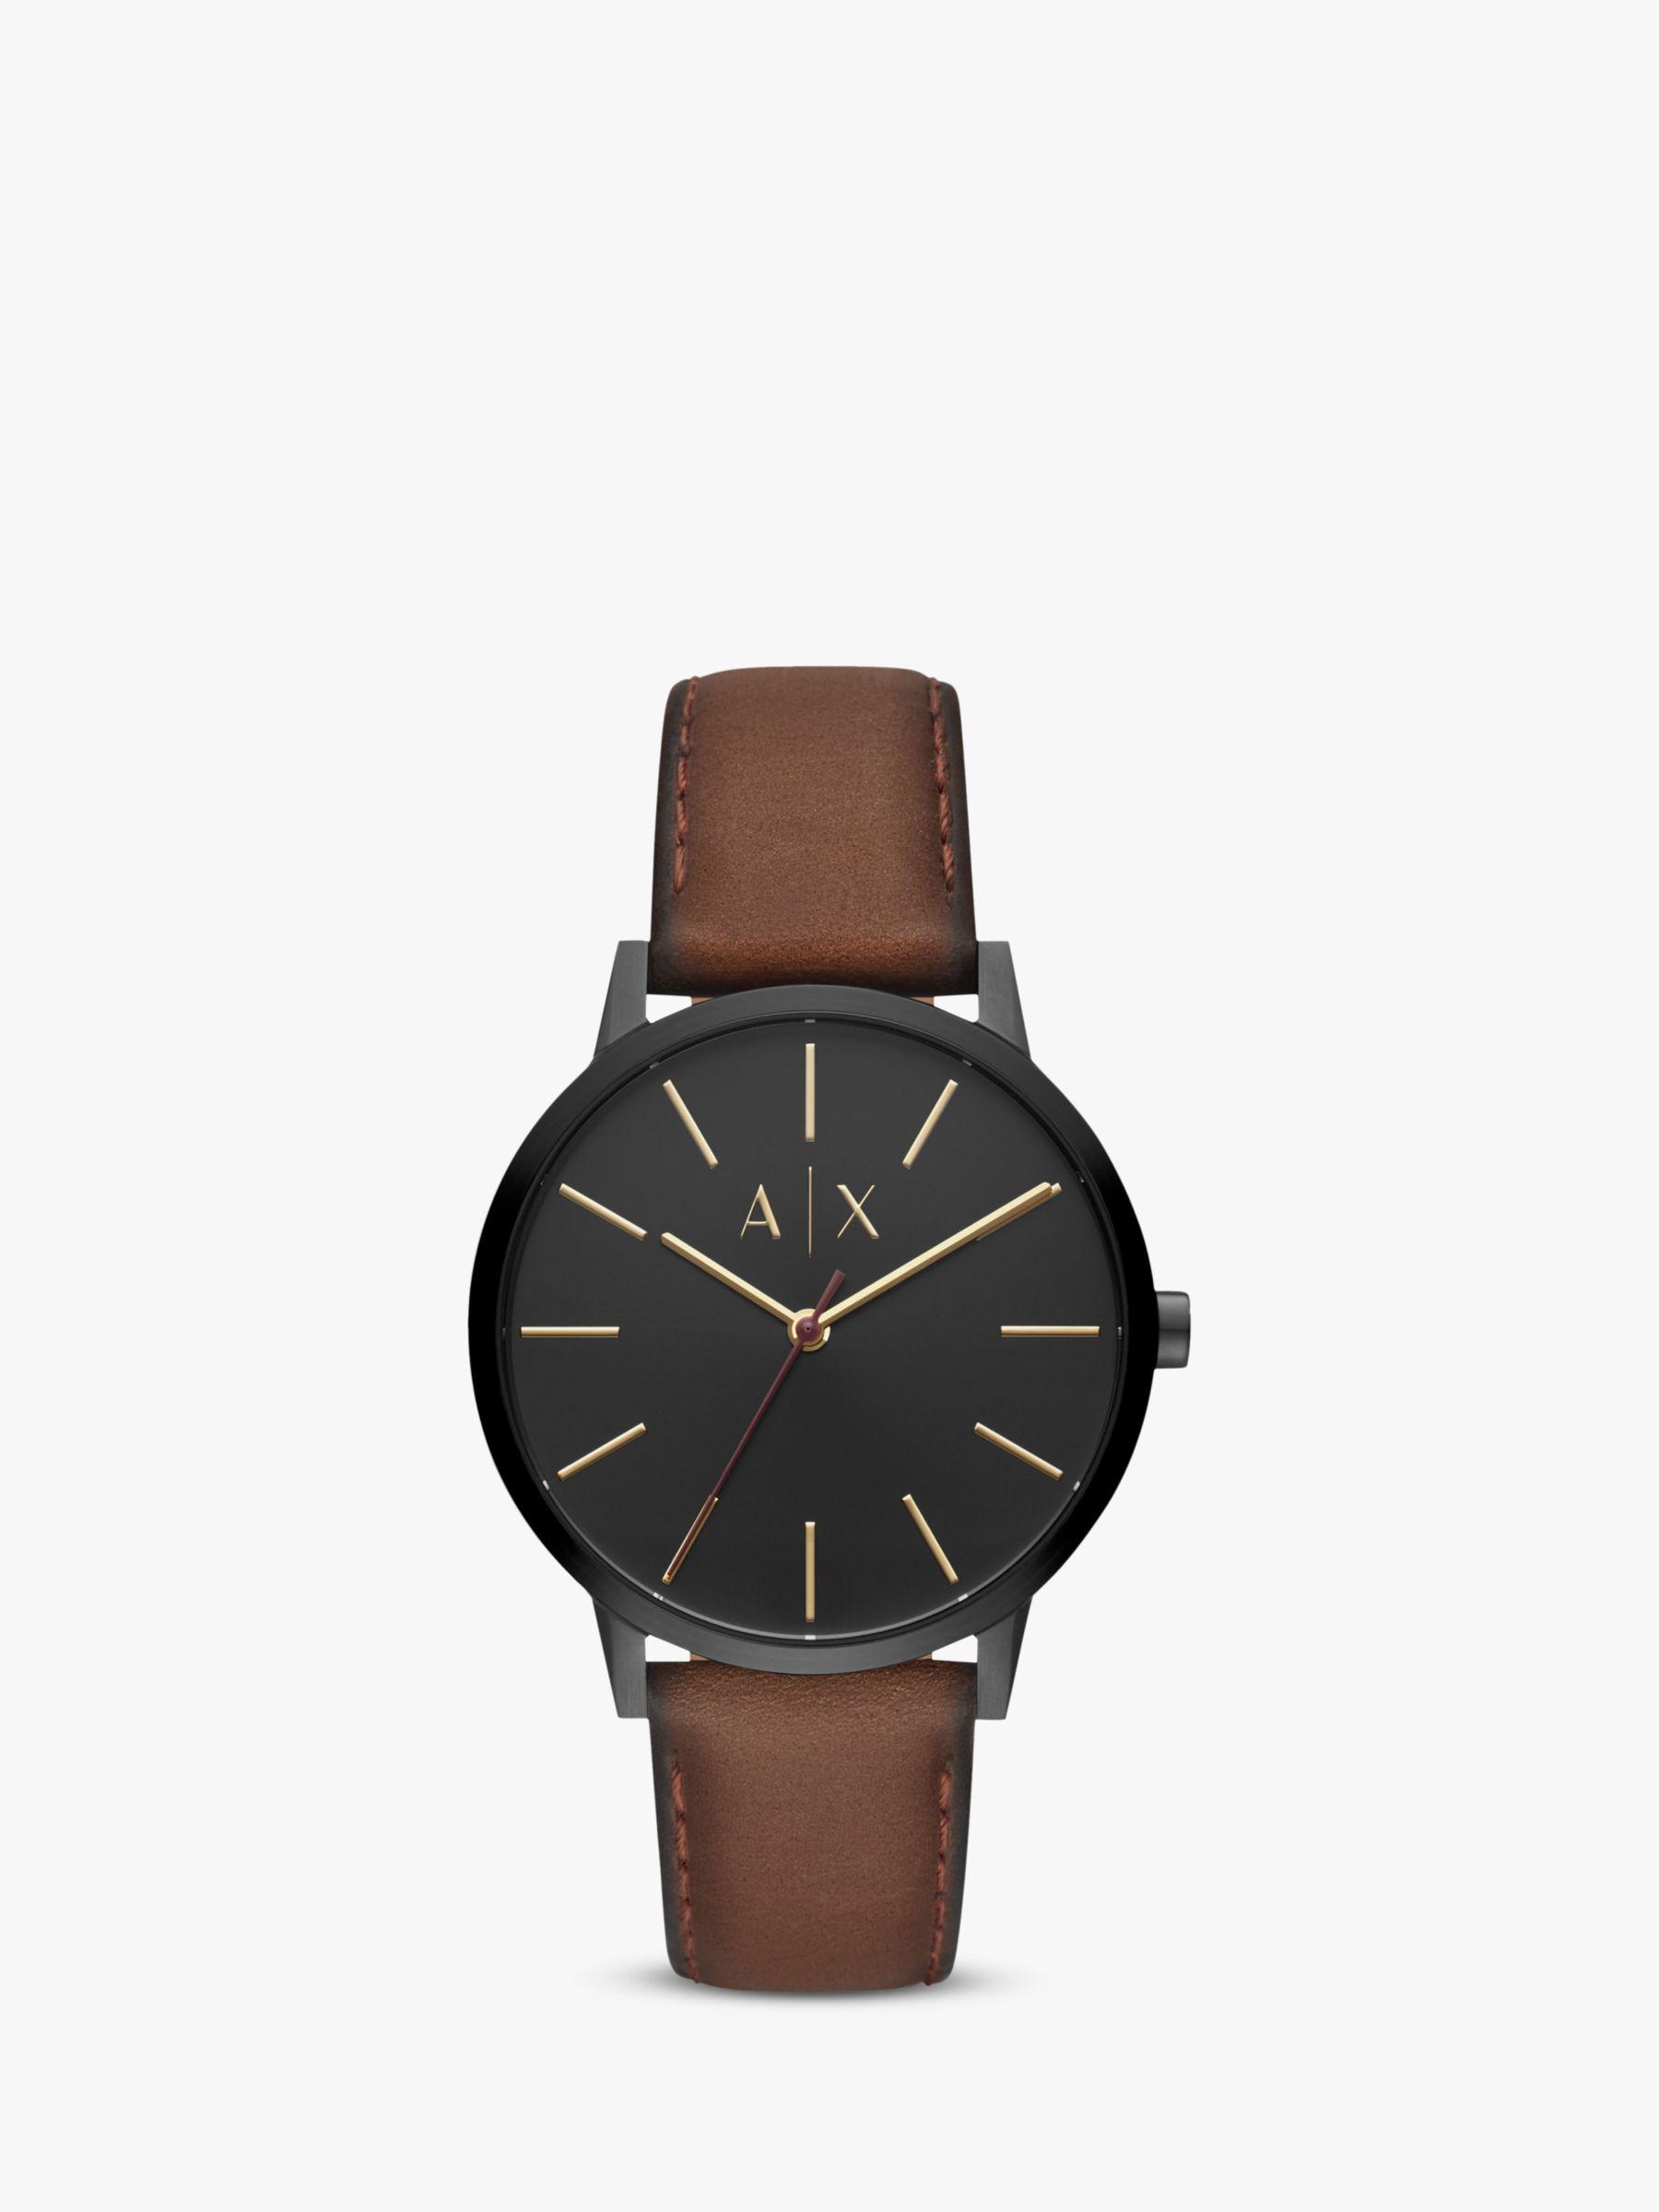 Armani Exchange Armani Exchange Men's Leather Strap Watch